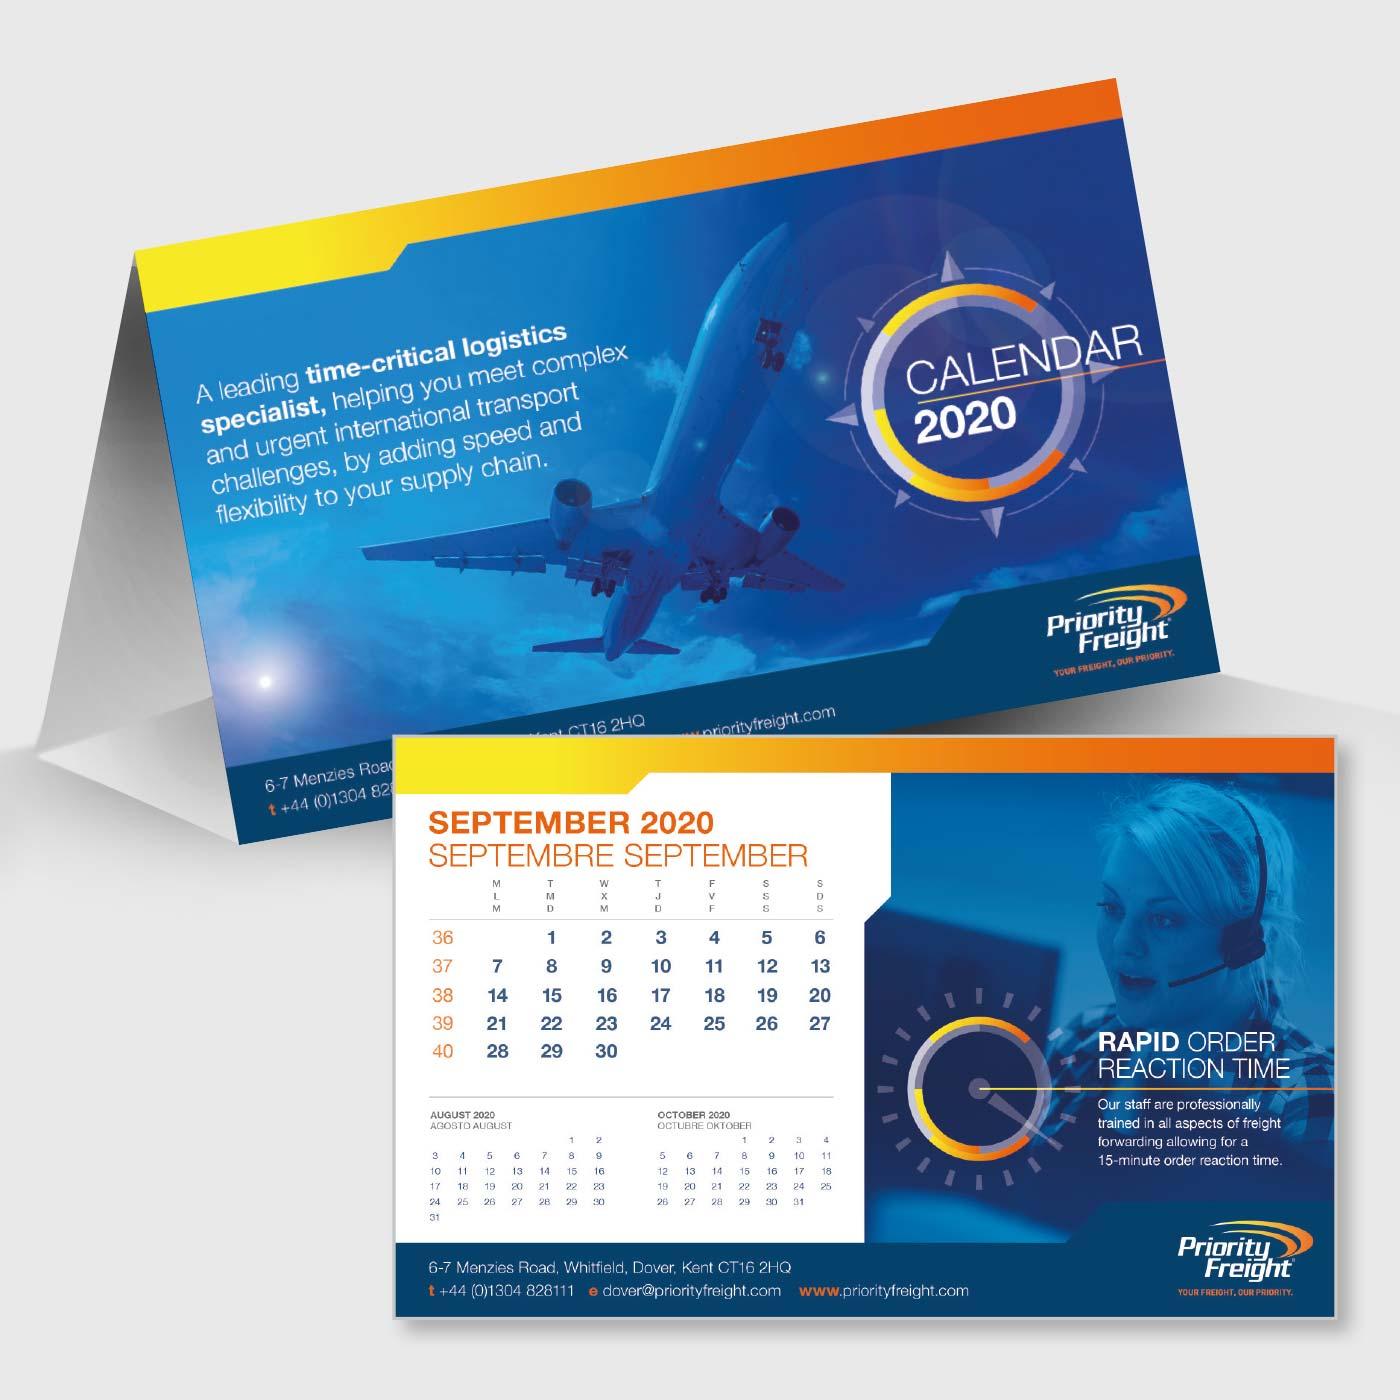 Priority Freight 2020 Desk Calendar